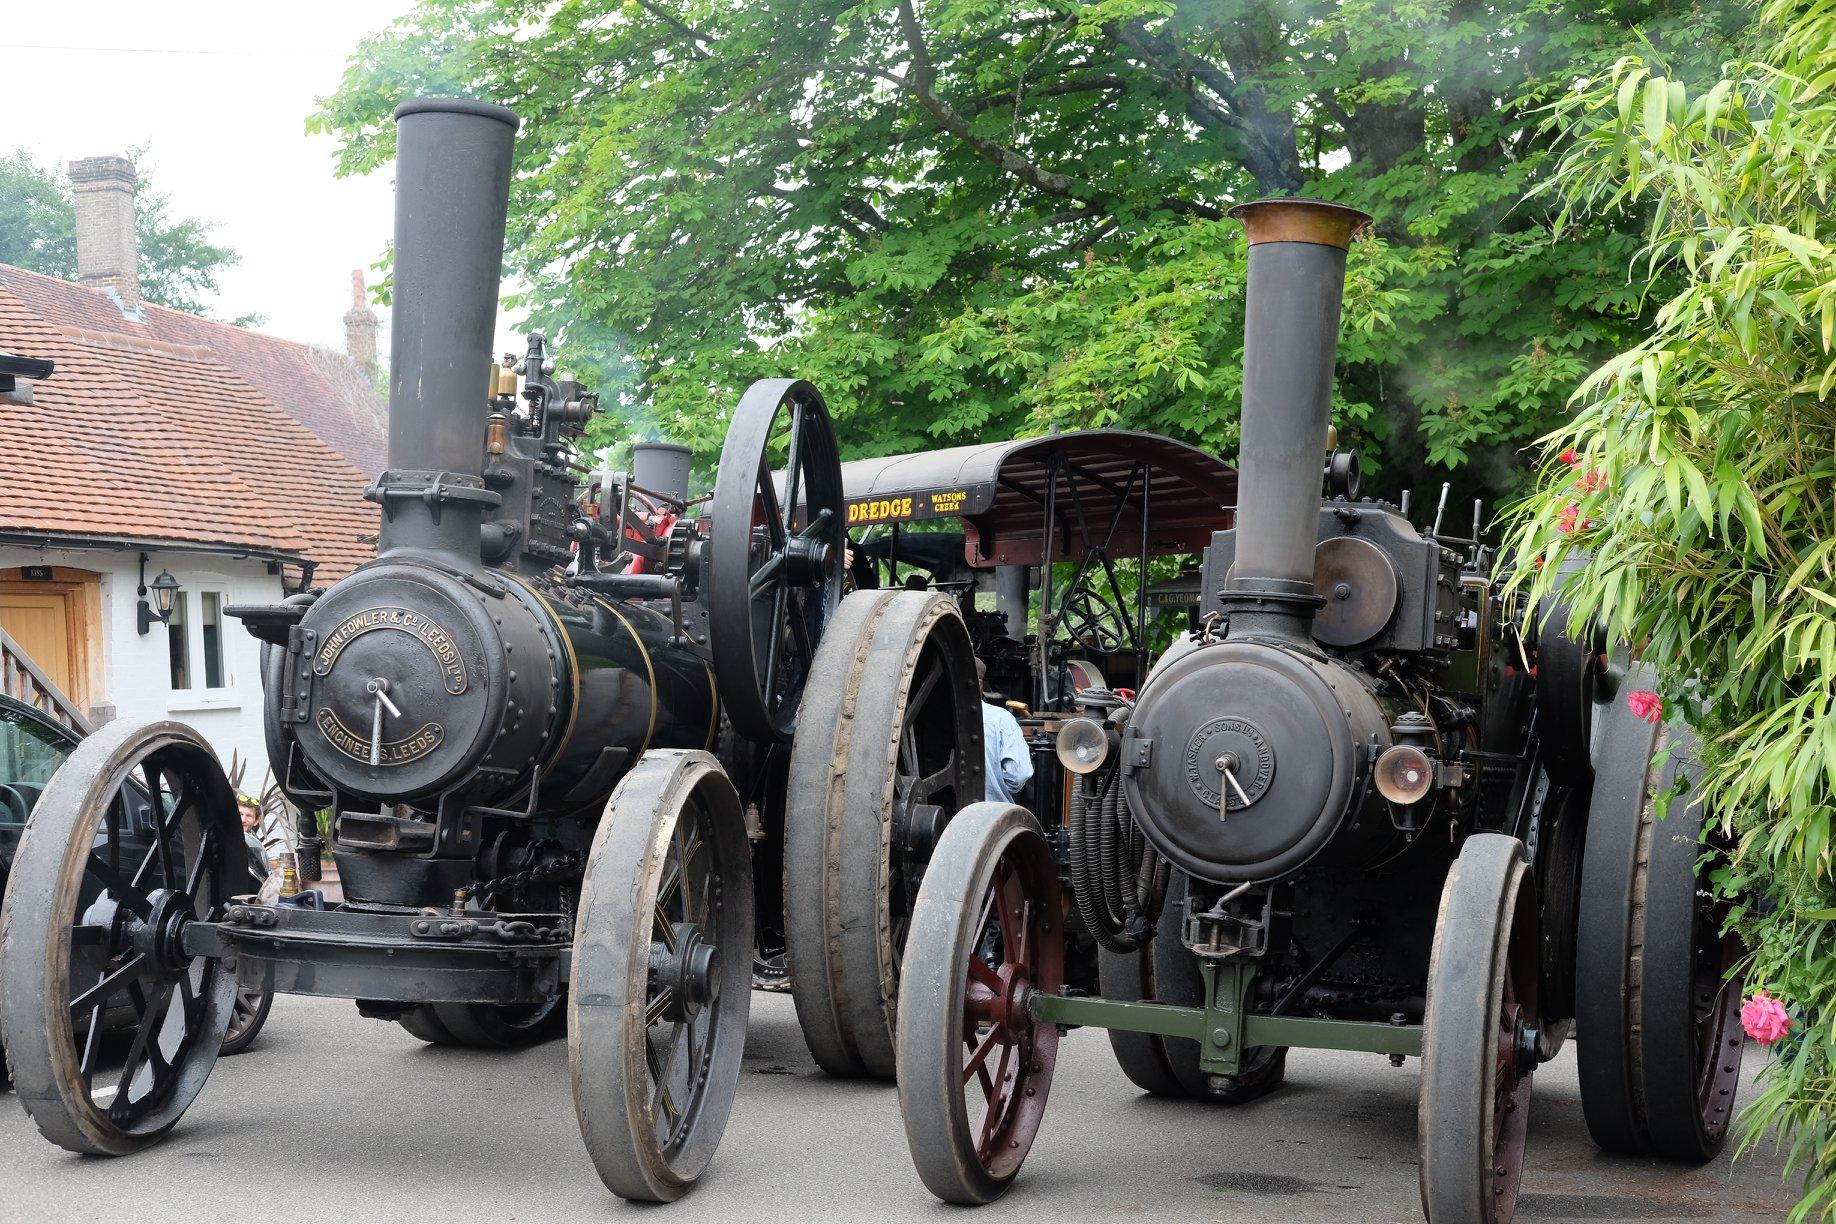 blackboys-inn-steam-engine-rally-2